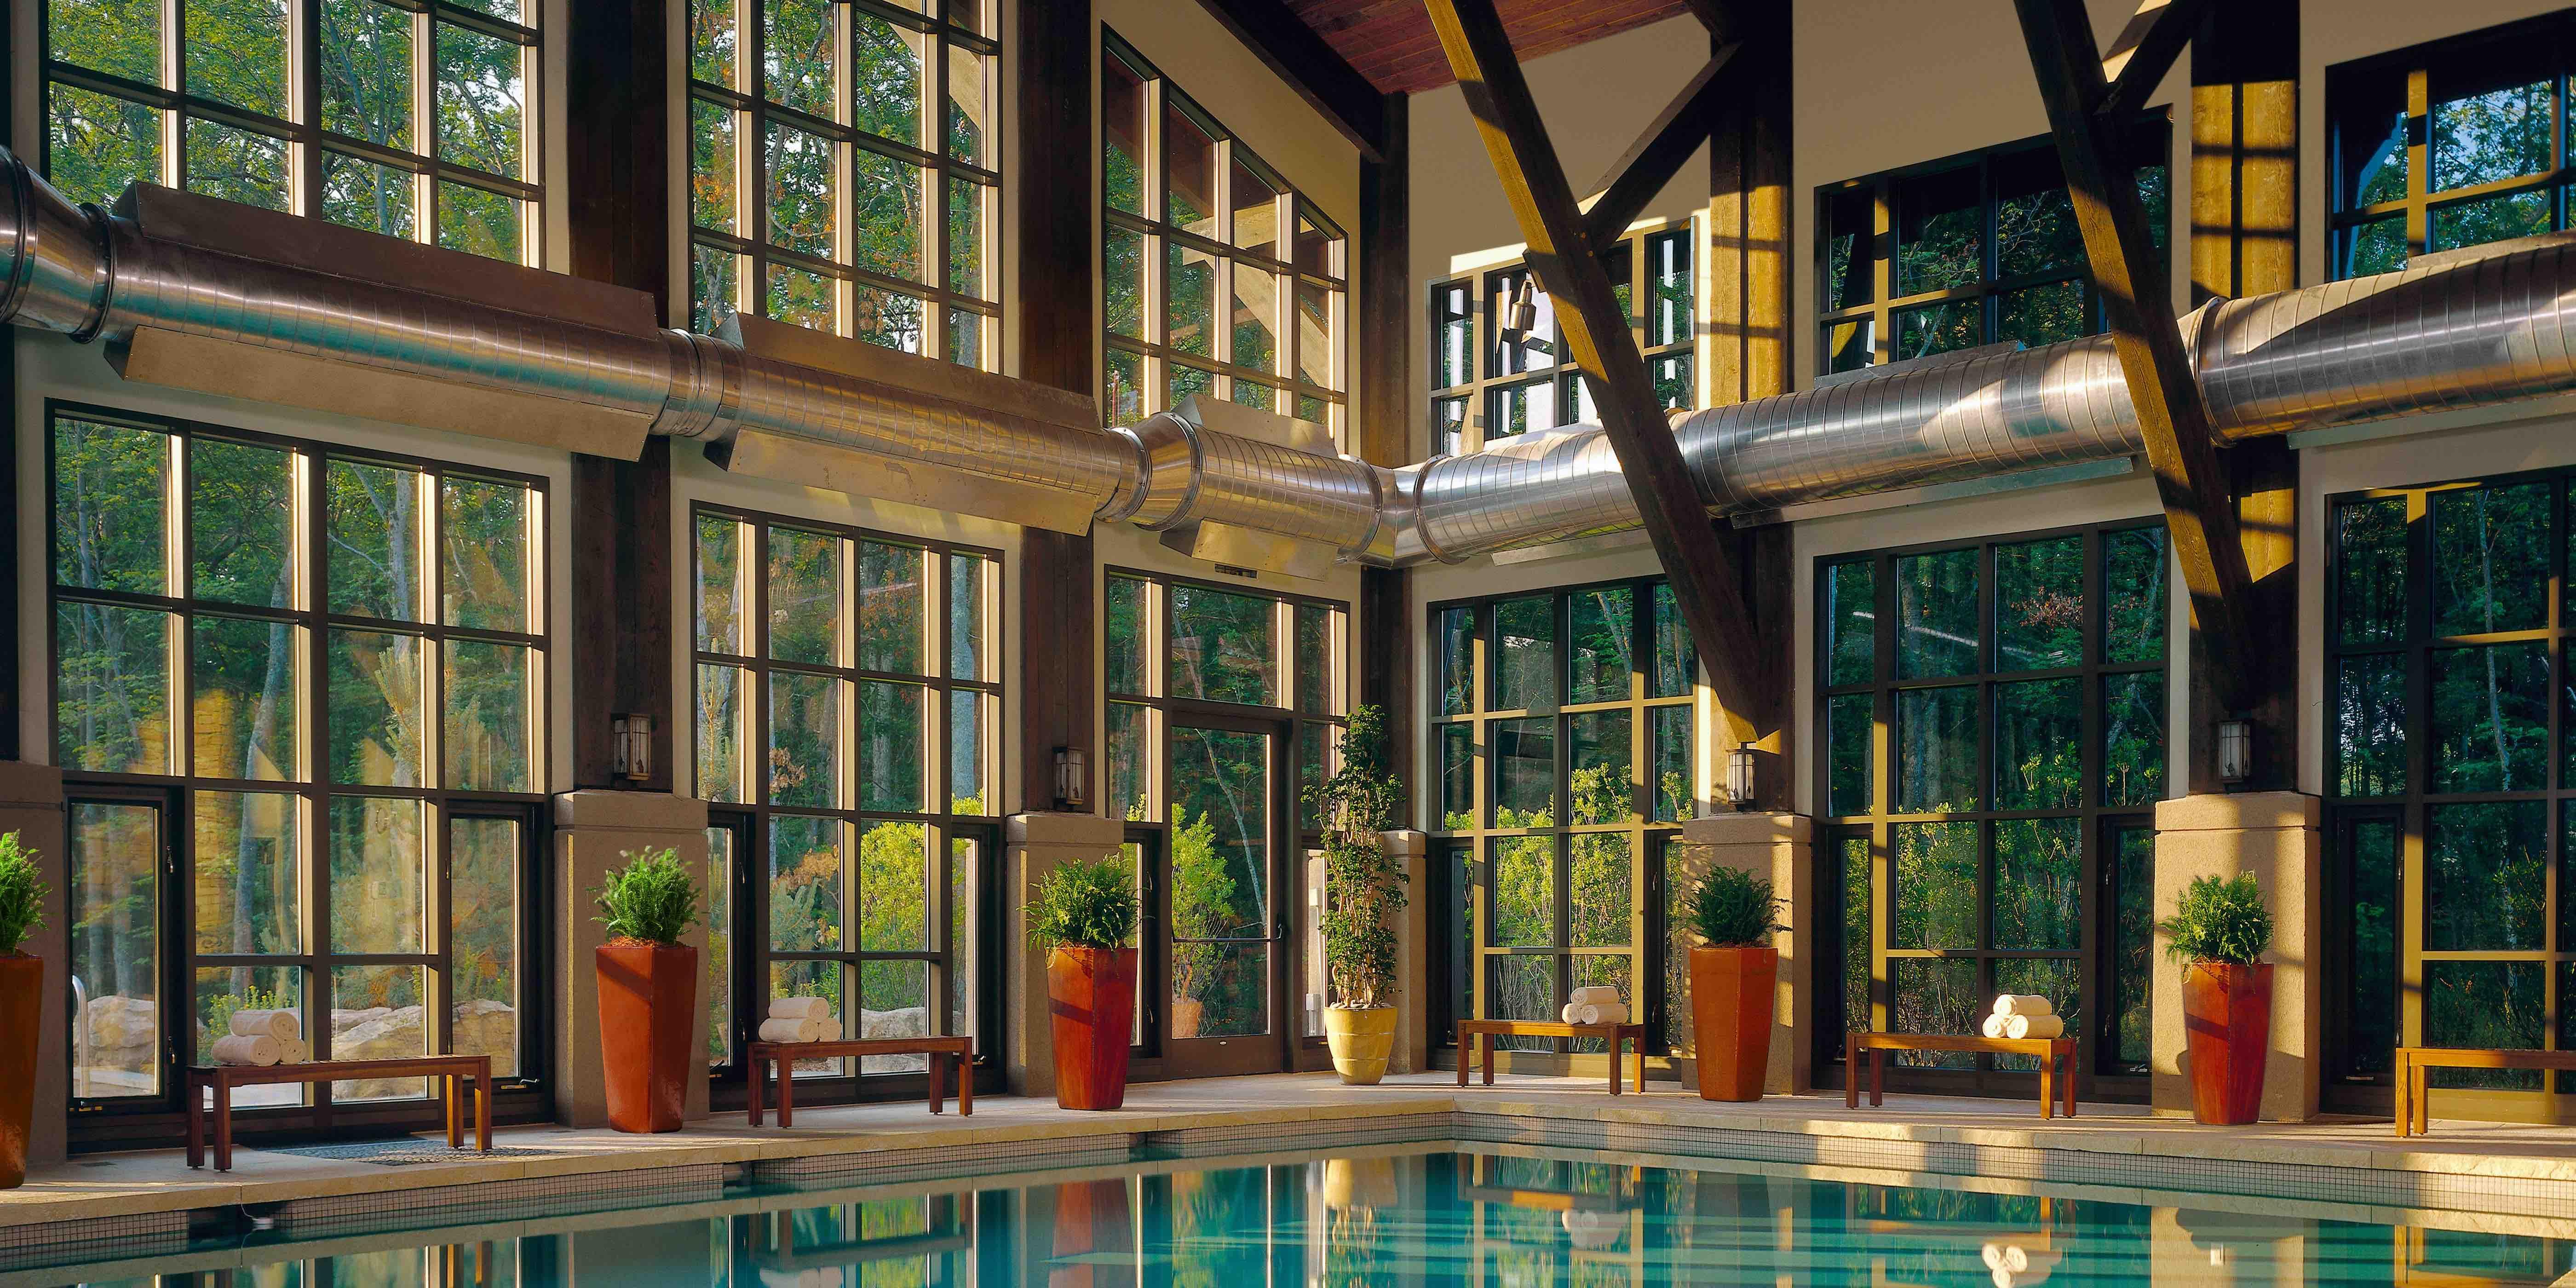 5 Beautiful Wellness Resorts To Visit In Pennsylvania